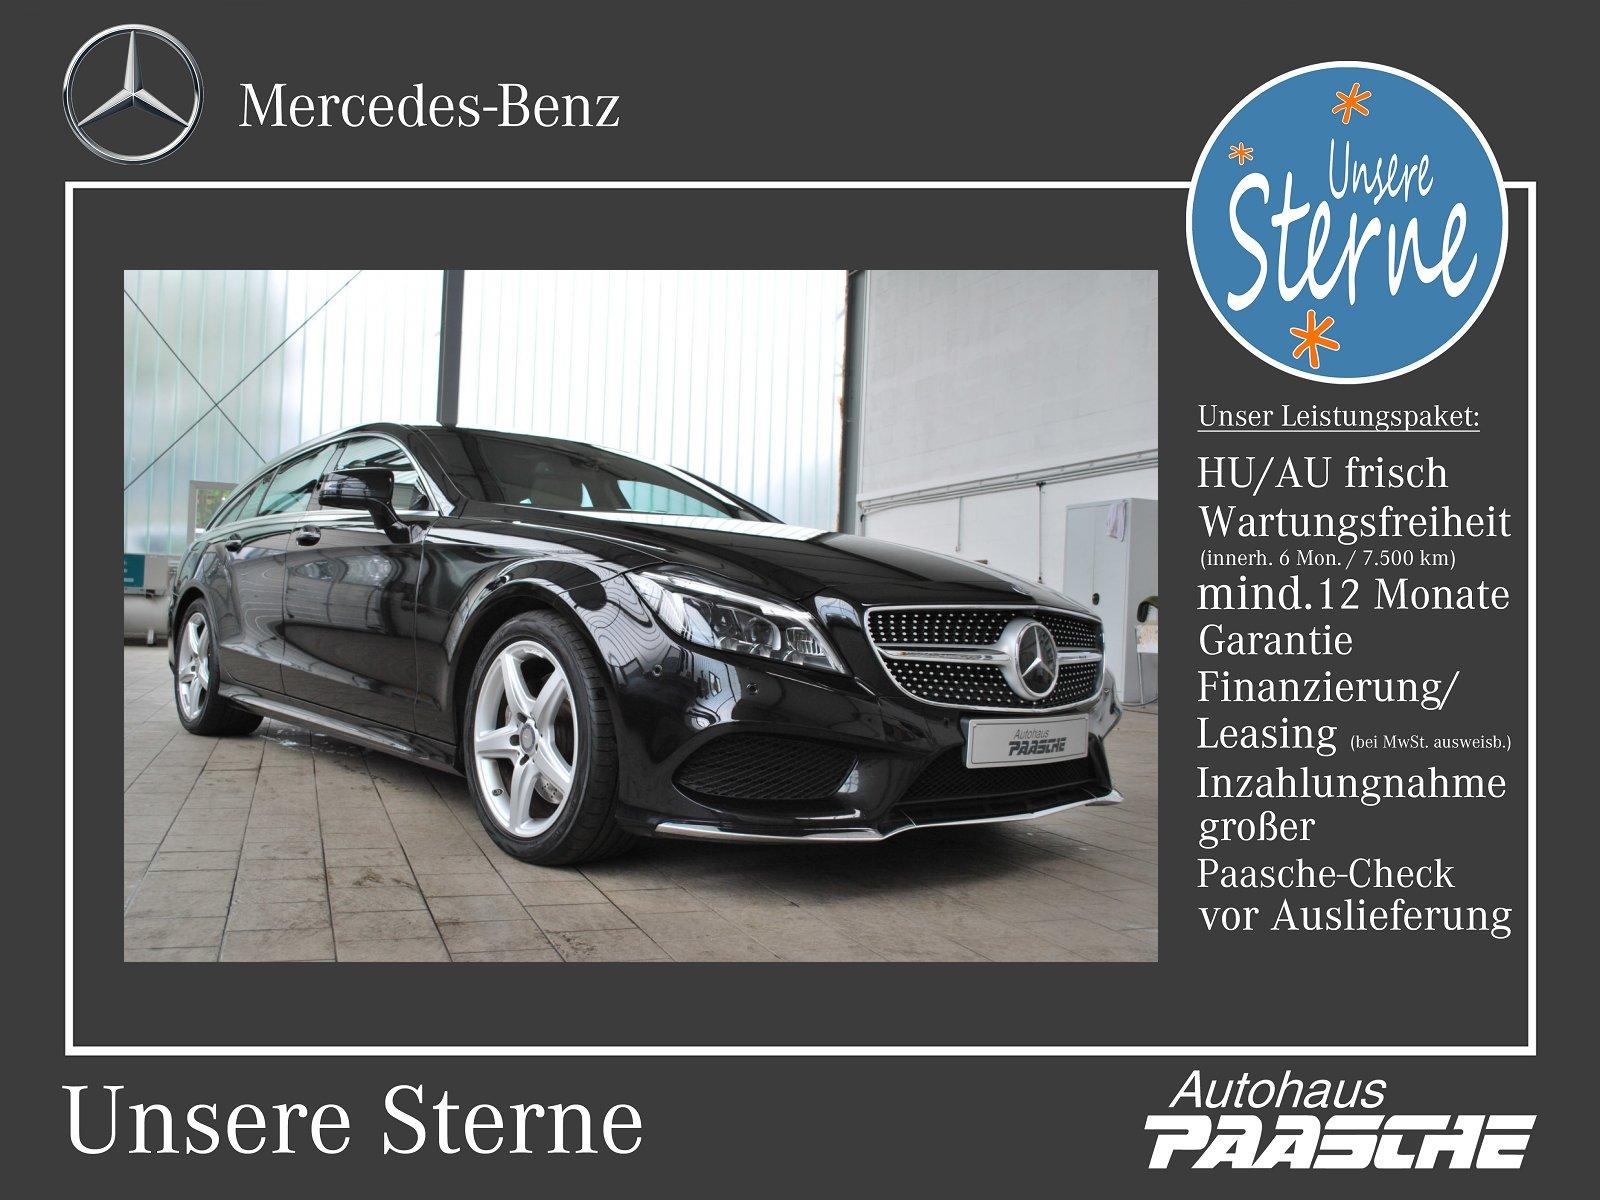 Mercedes-Benz CLS 400 Shooting Brake AMG Line/COMAND/SHD Klima, Jahr 2016, Benzin